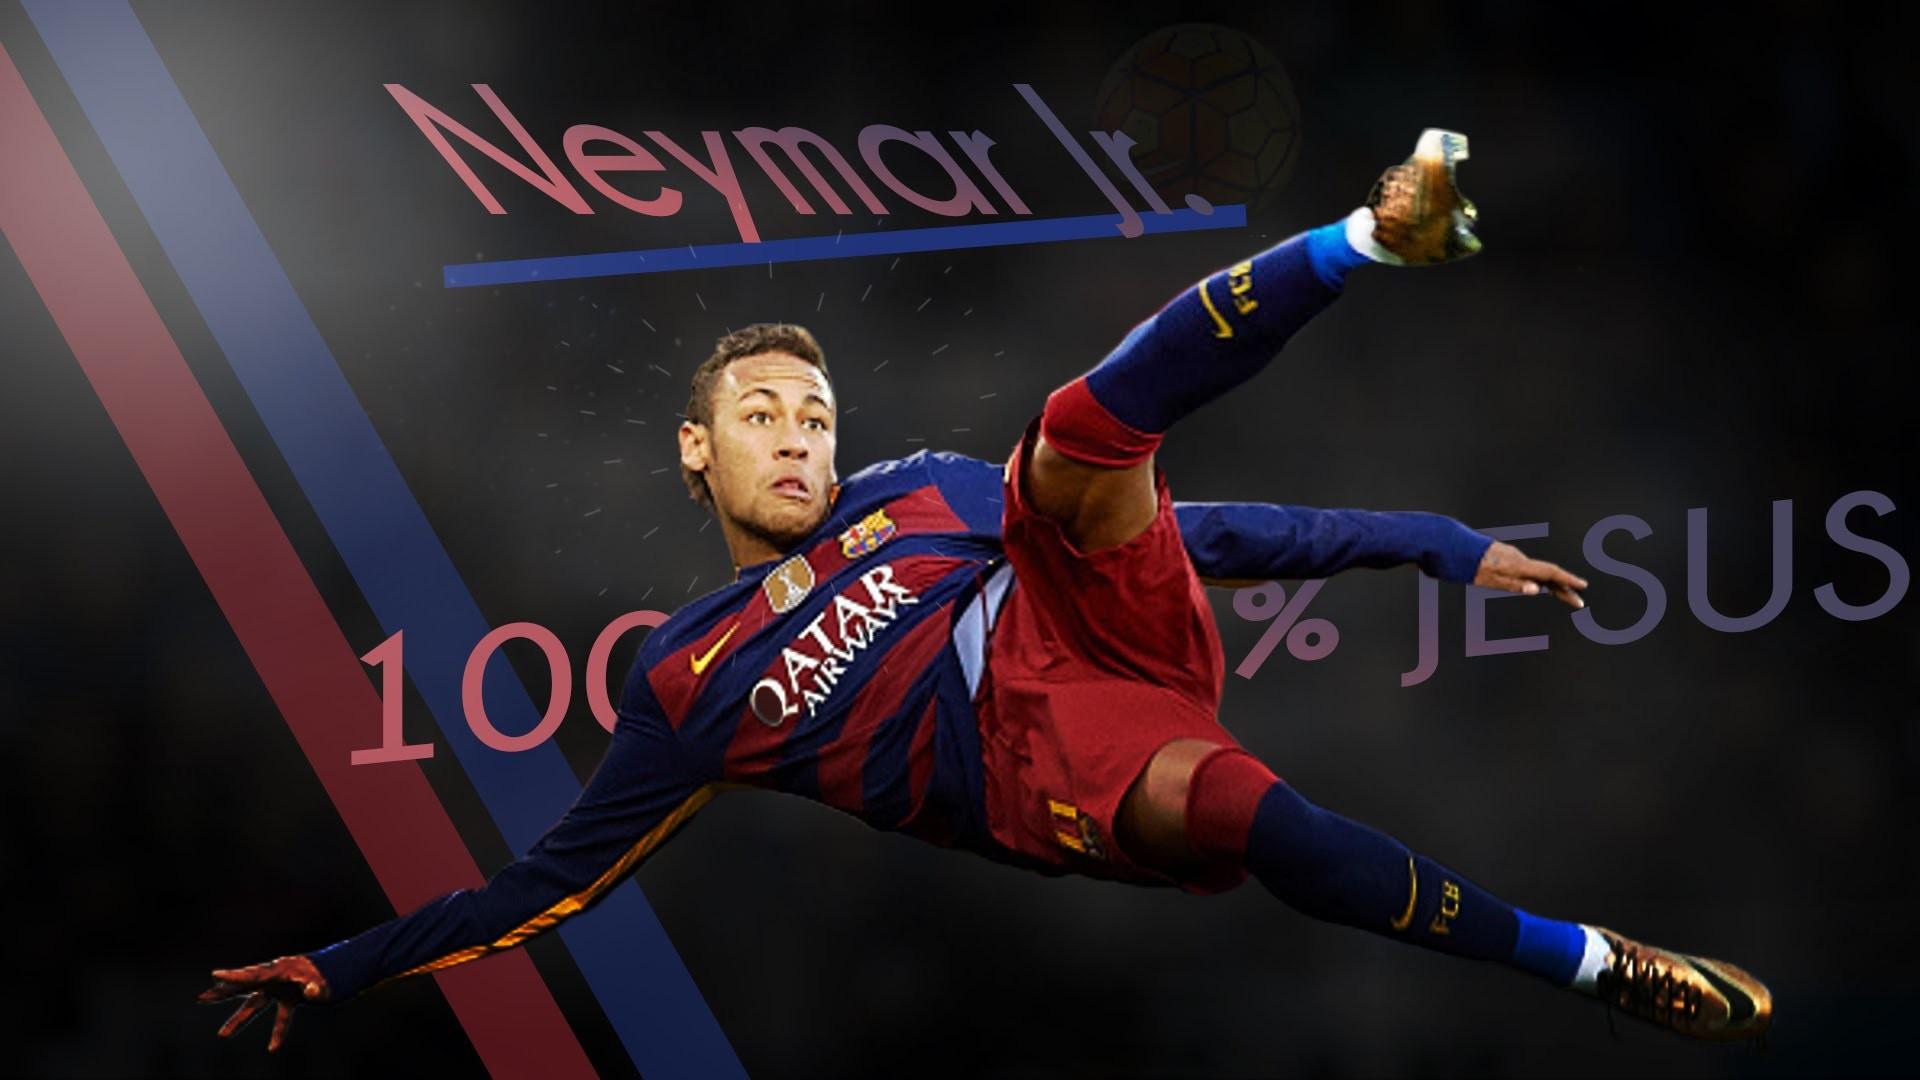 Neymar Wallpaper 2017 HD ·① WallpaperTag